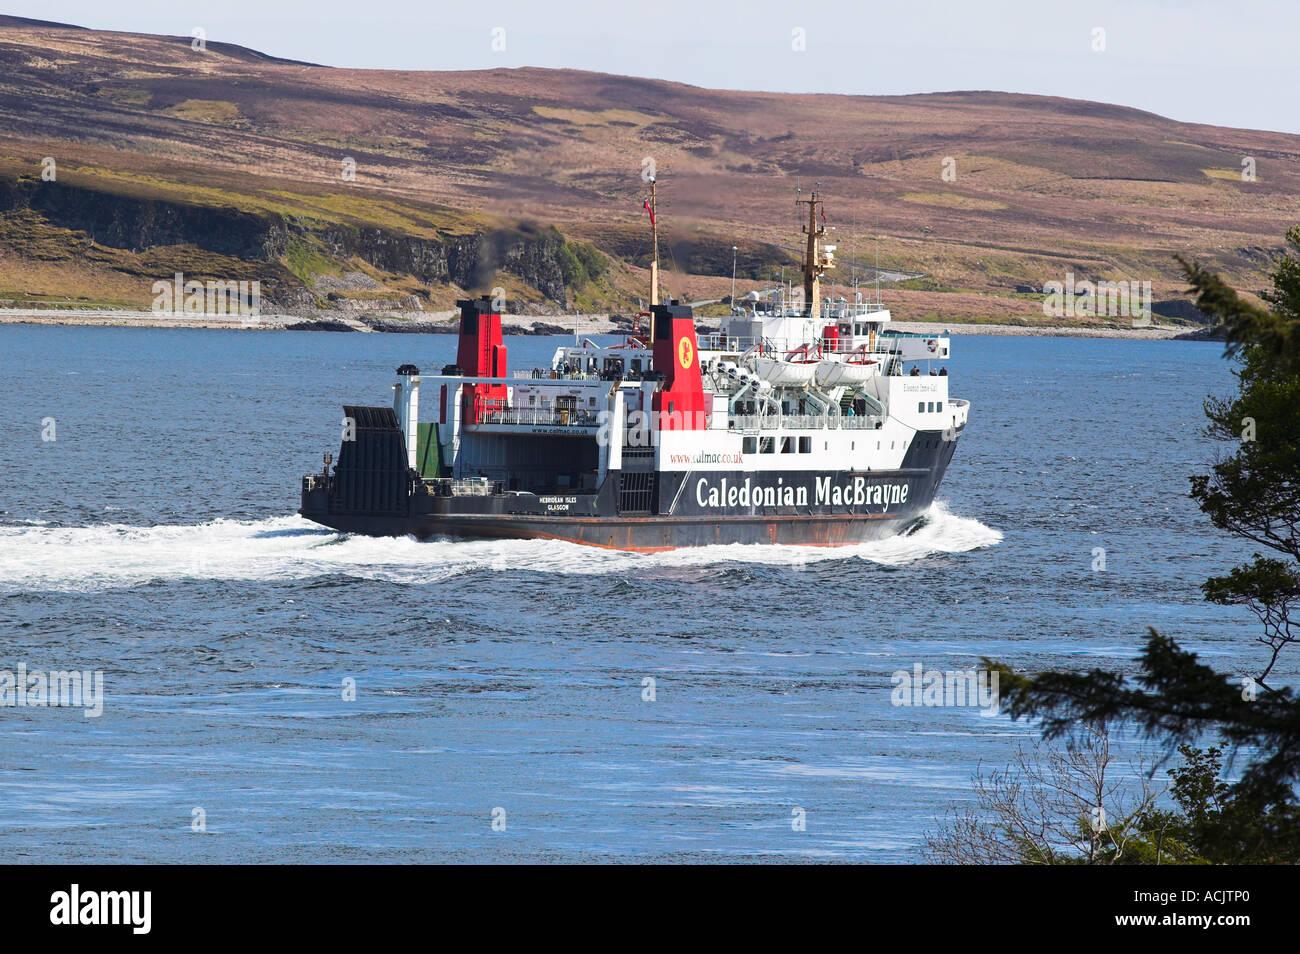 isle of jura ferry photos & isle of jura ferry images - alamy